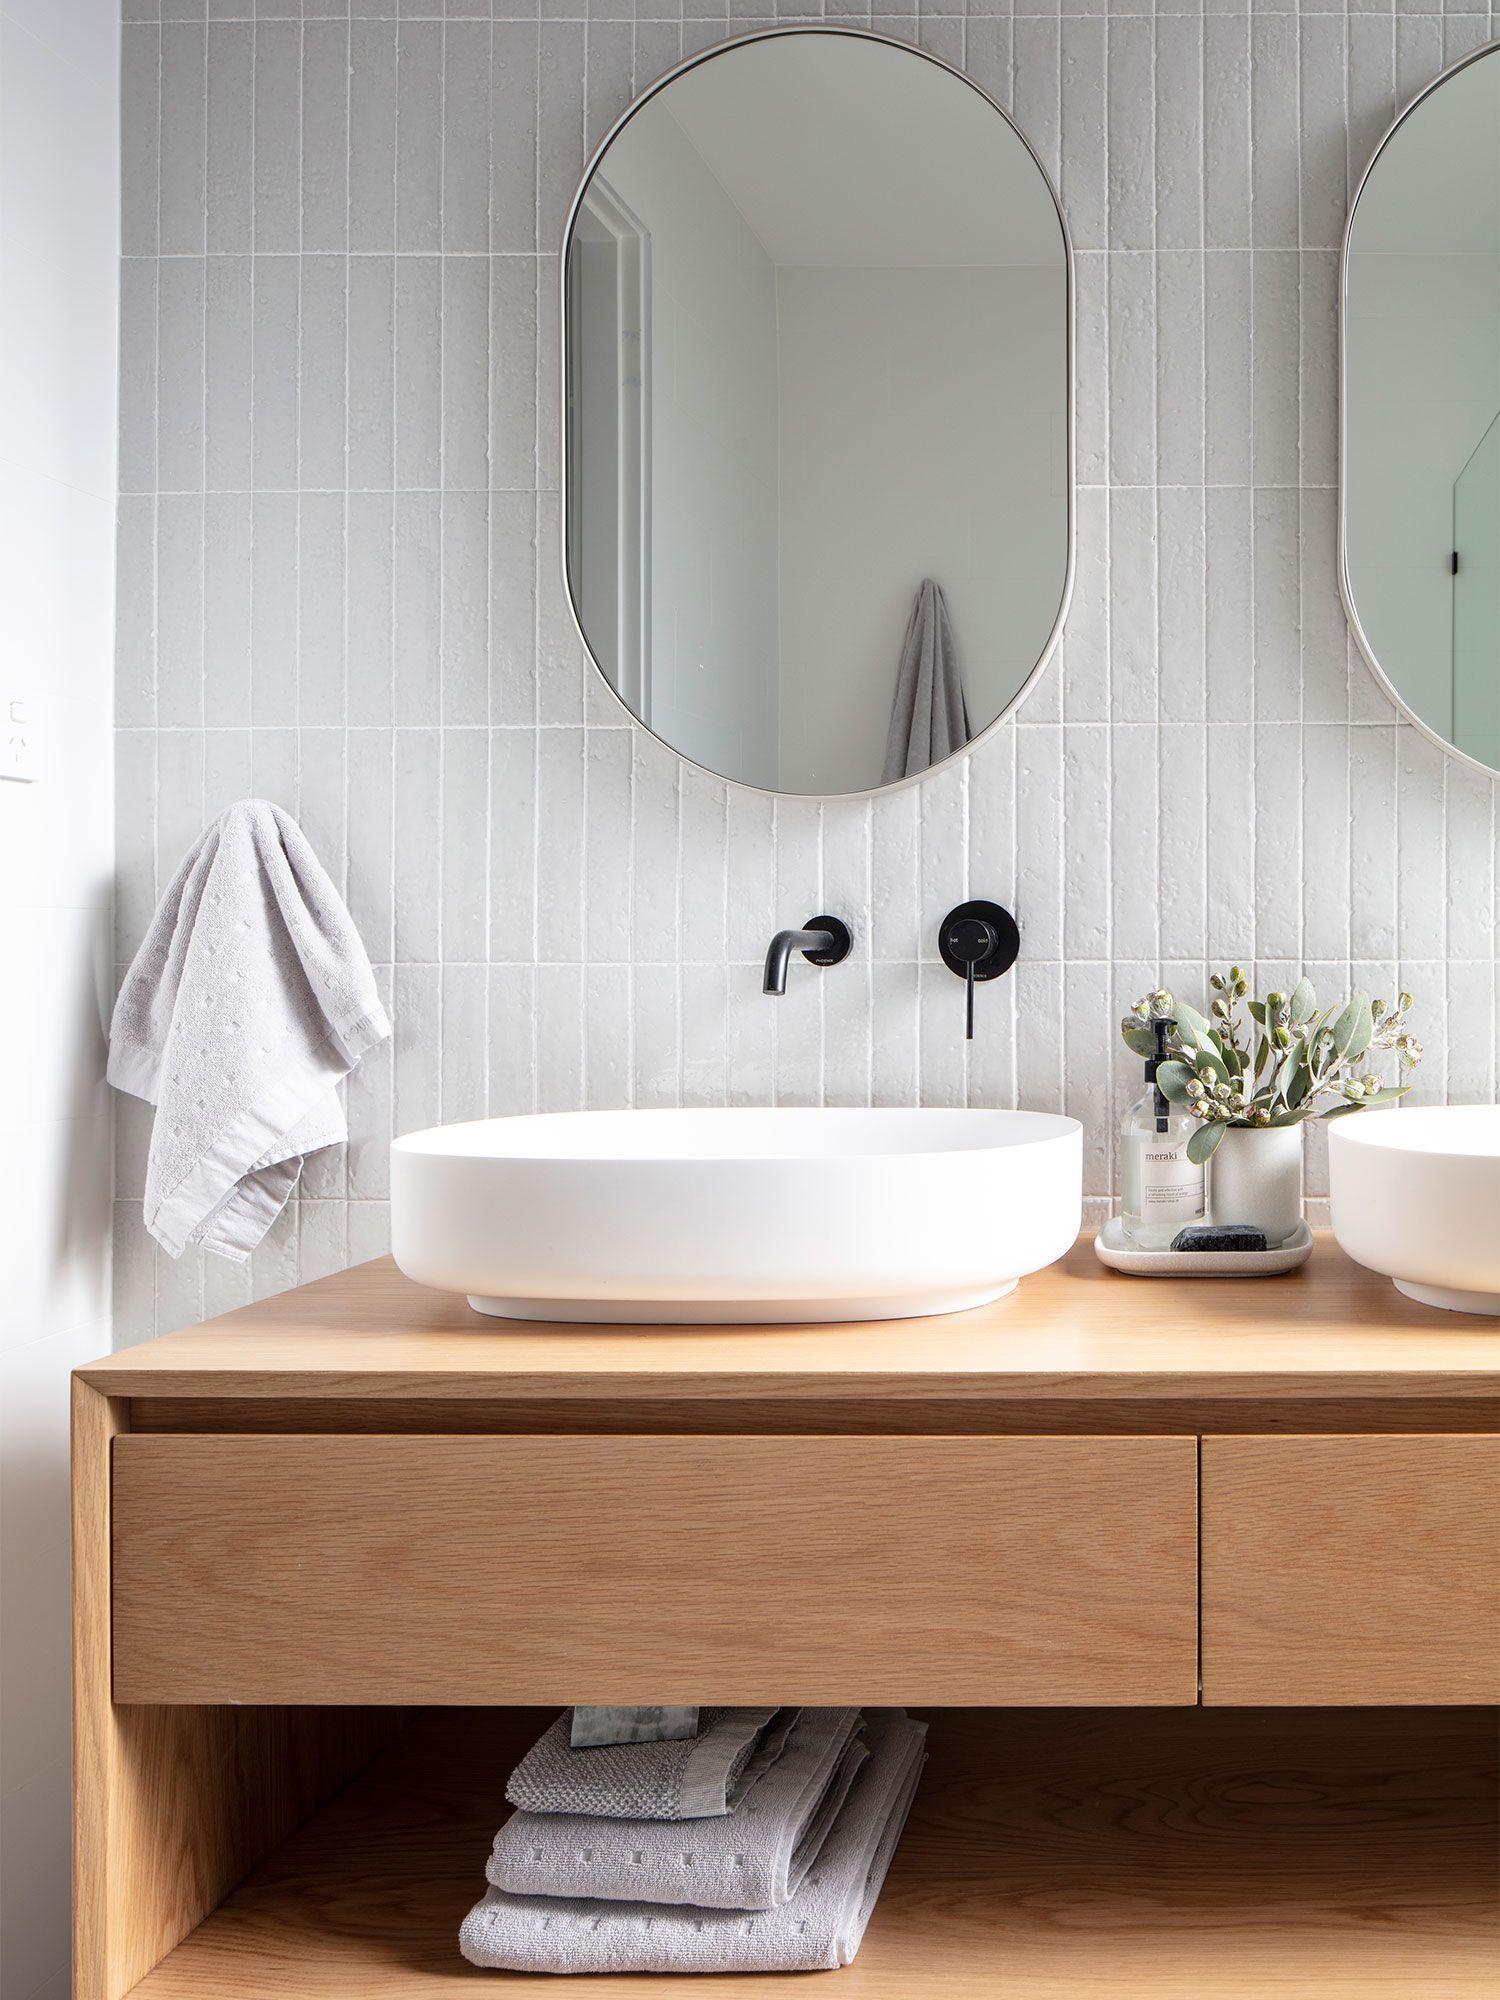 Backlitbathroommirror Top Bathroom Design Bathroom Interior Design Bathroom Interior Top bathroom ceramic inspiration